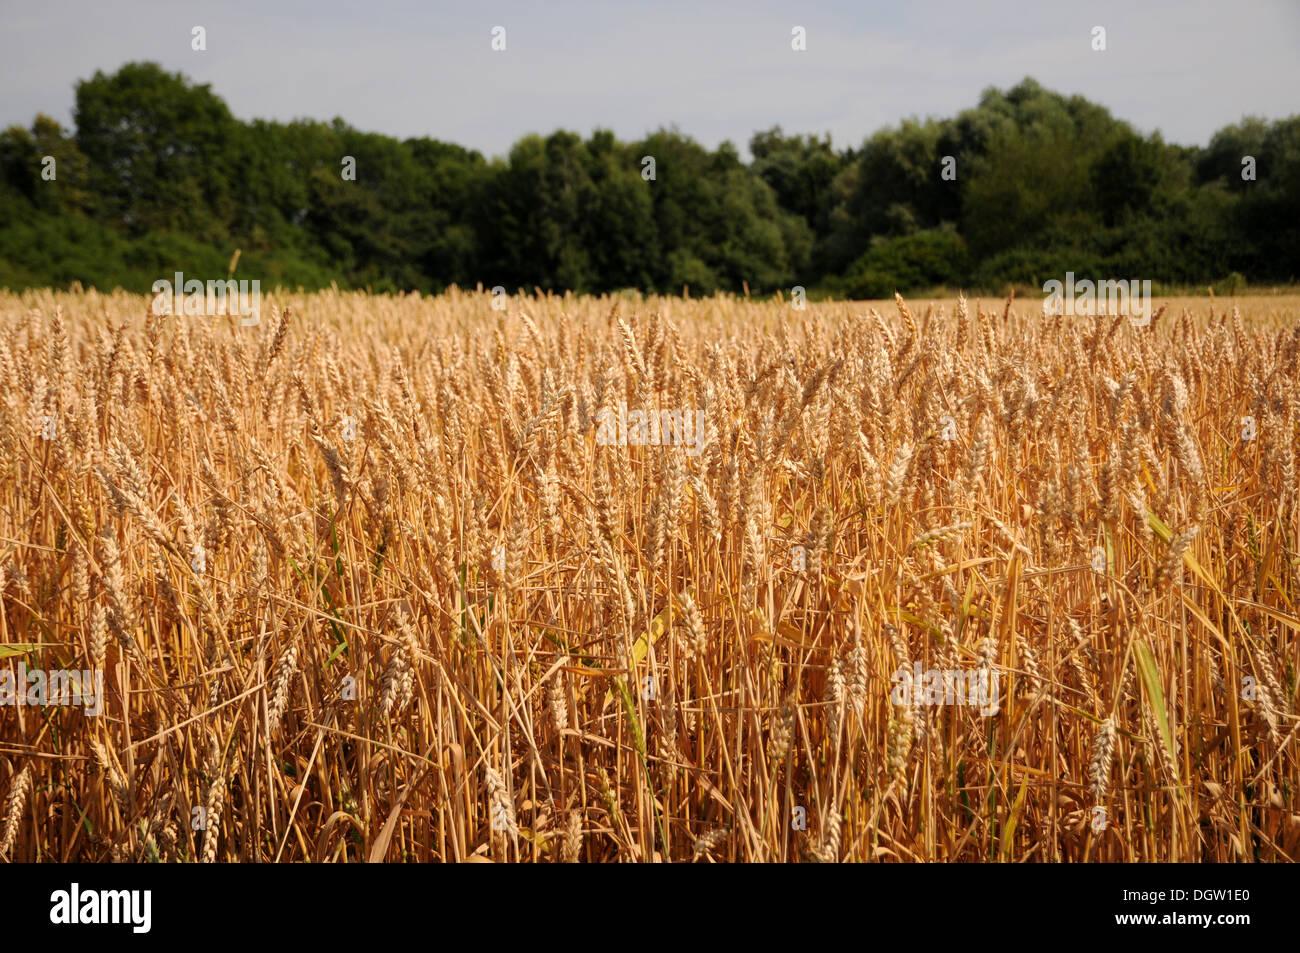 Ripe Wheat-Field - Stock Image